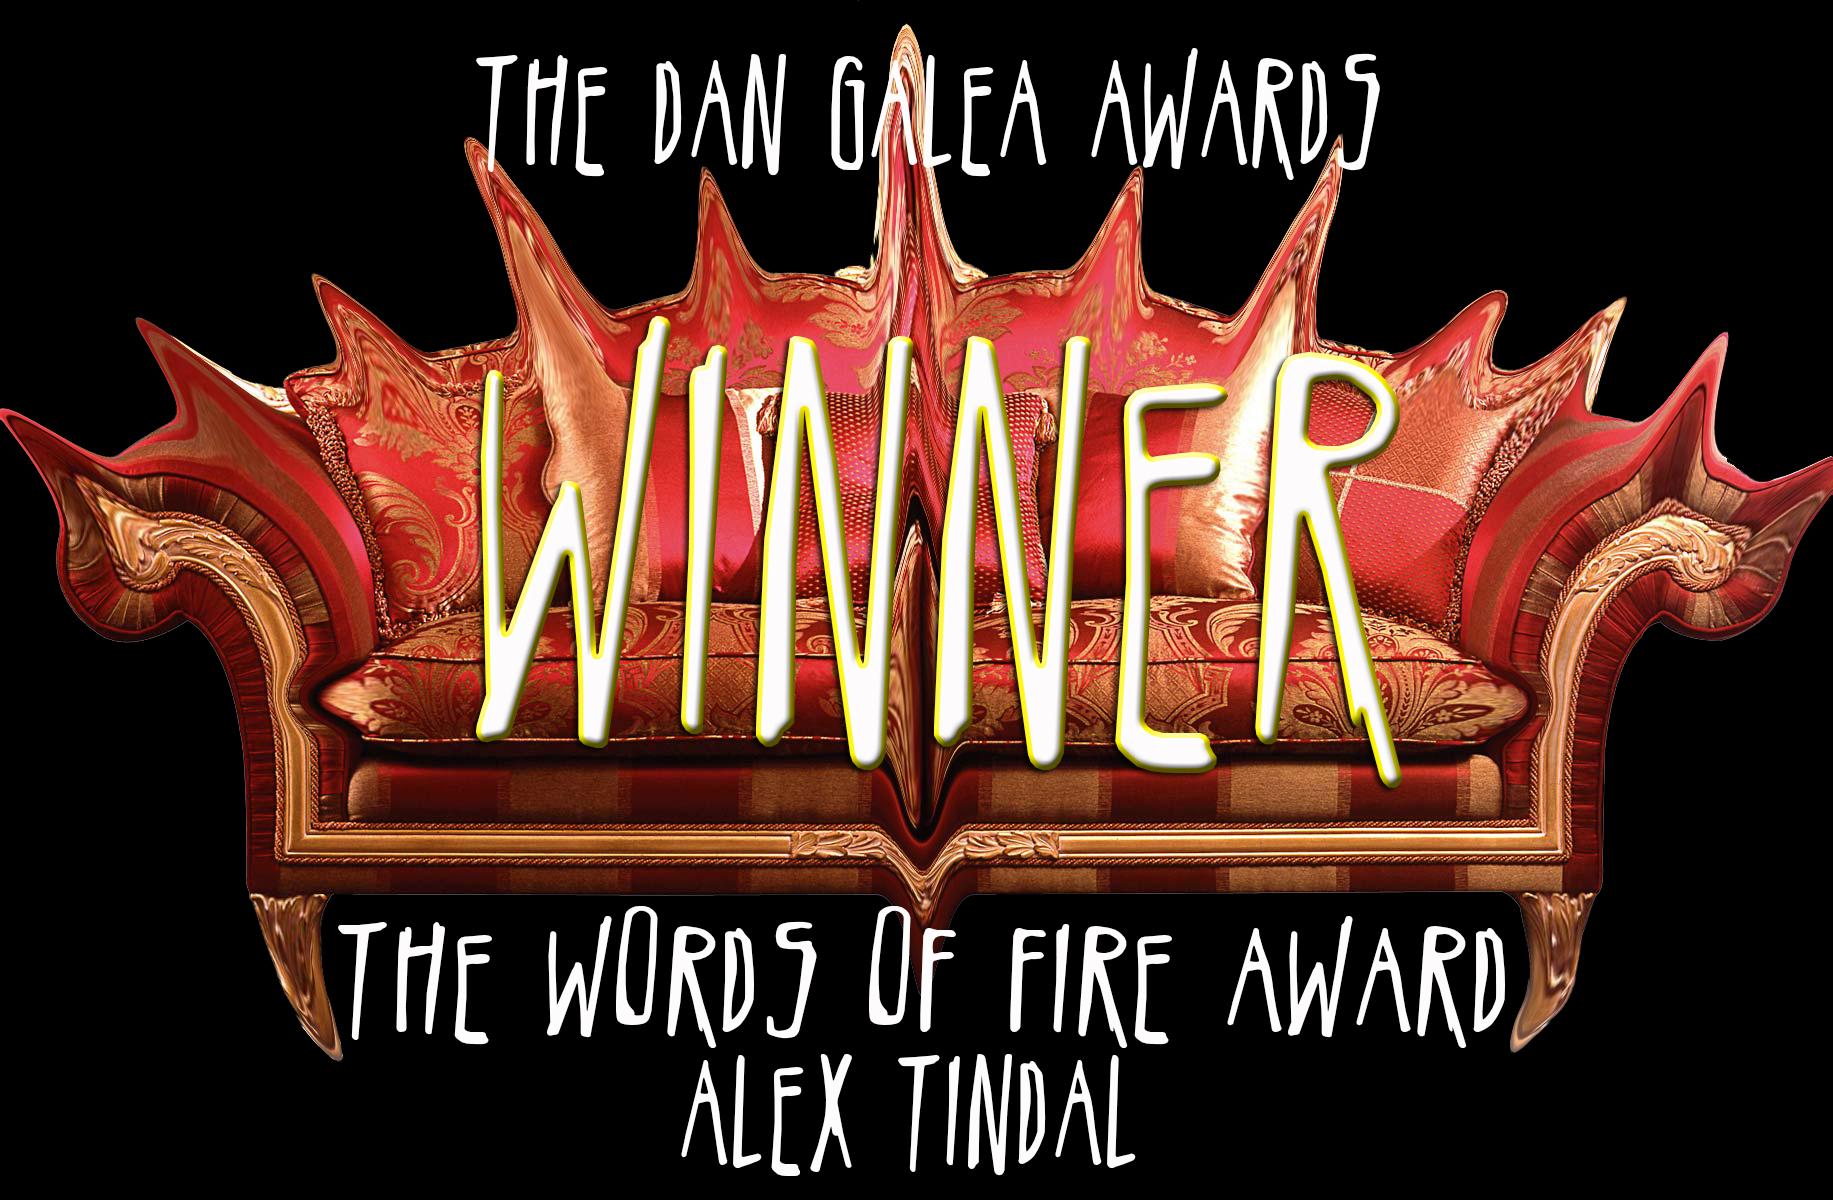 DGawards ALEX TINDAL.jpg